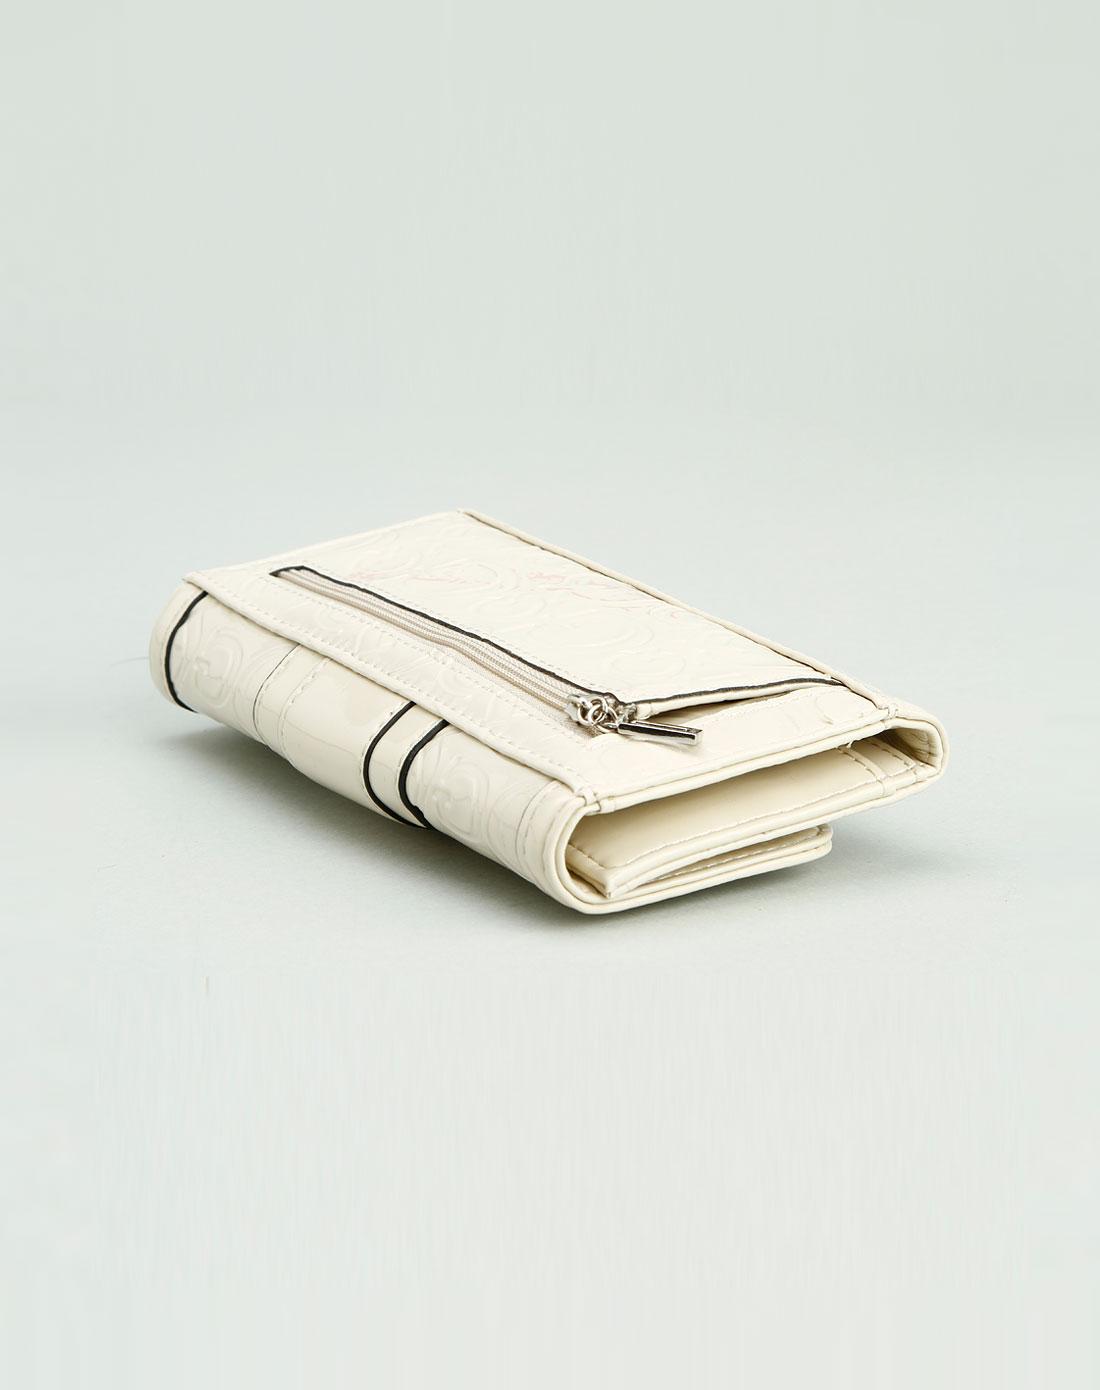 guess包包专场-女款米白色蛇纹高贵钱包